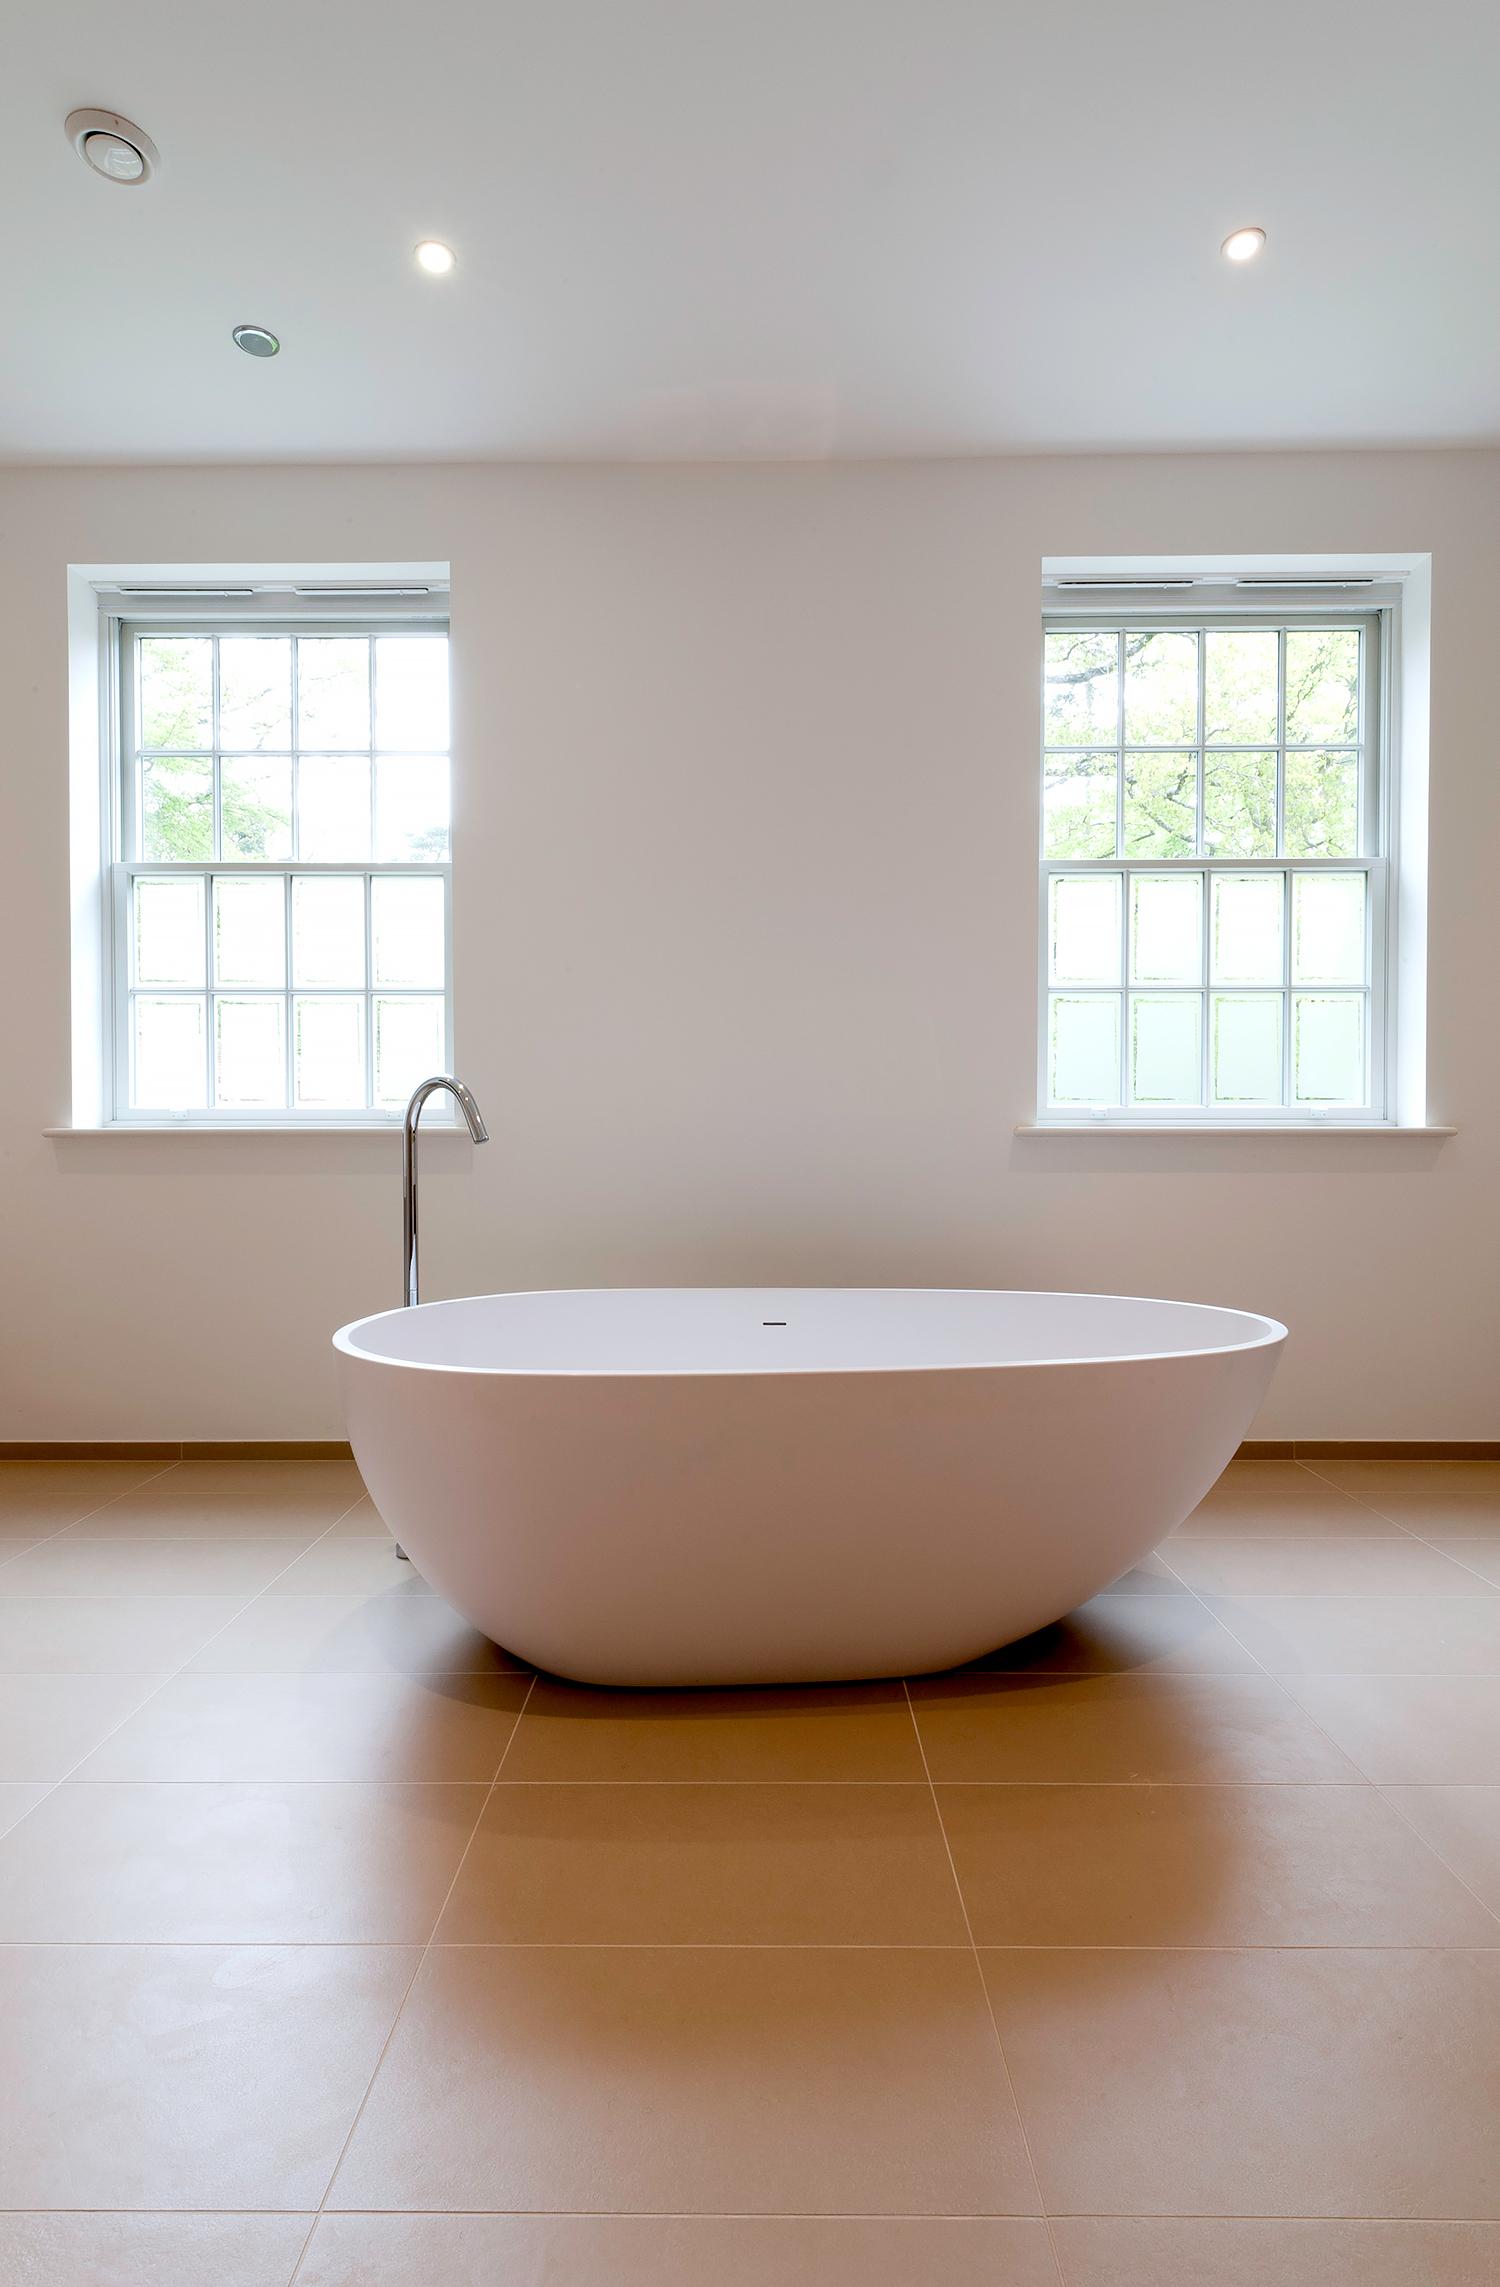 _interior-photography-residential-dorset-mileride-13.jpg